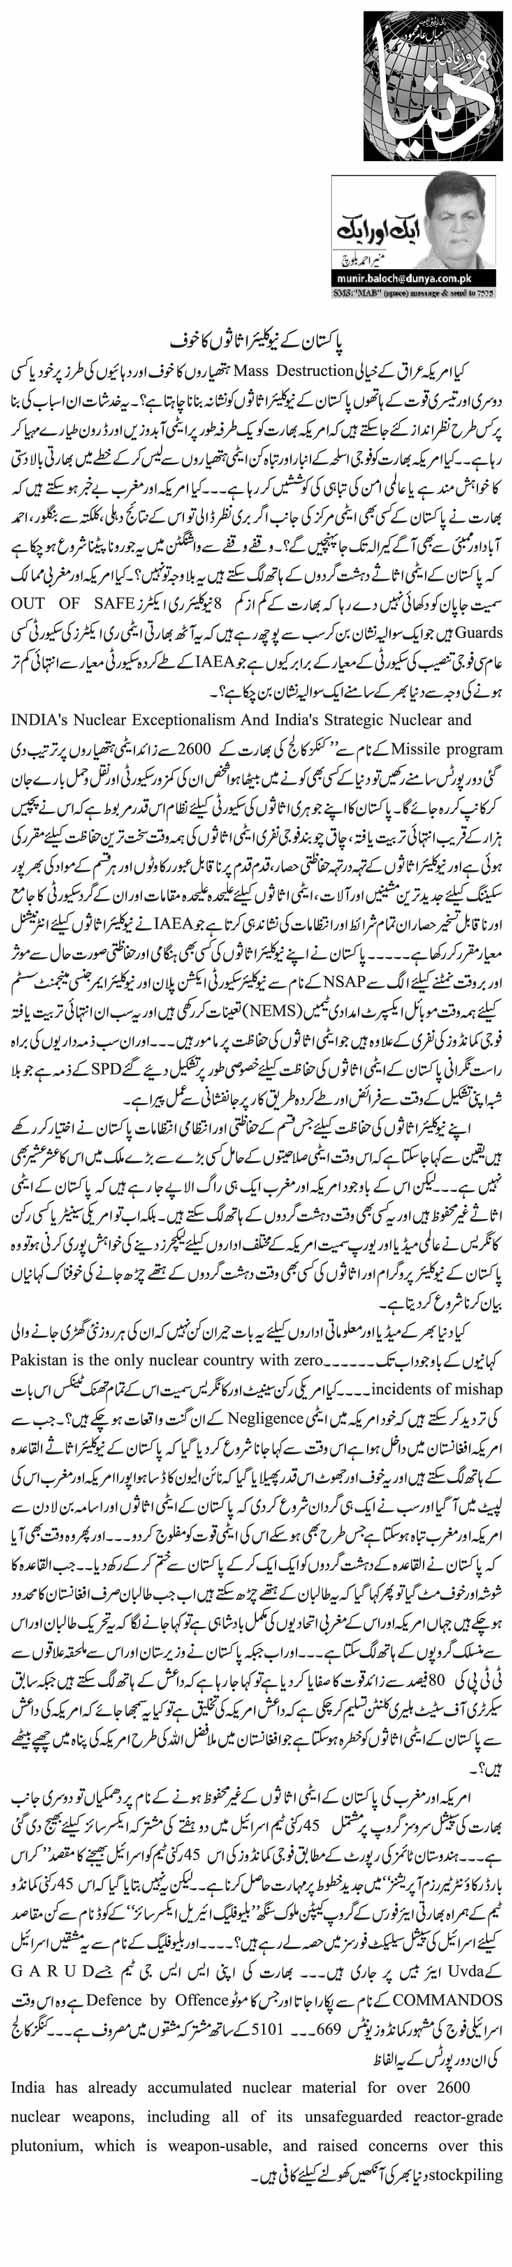 Pakistan Ke Nuclear Asason Ka Khauf | Munir Ahmad Baloch | Daily Urdu Columns